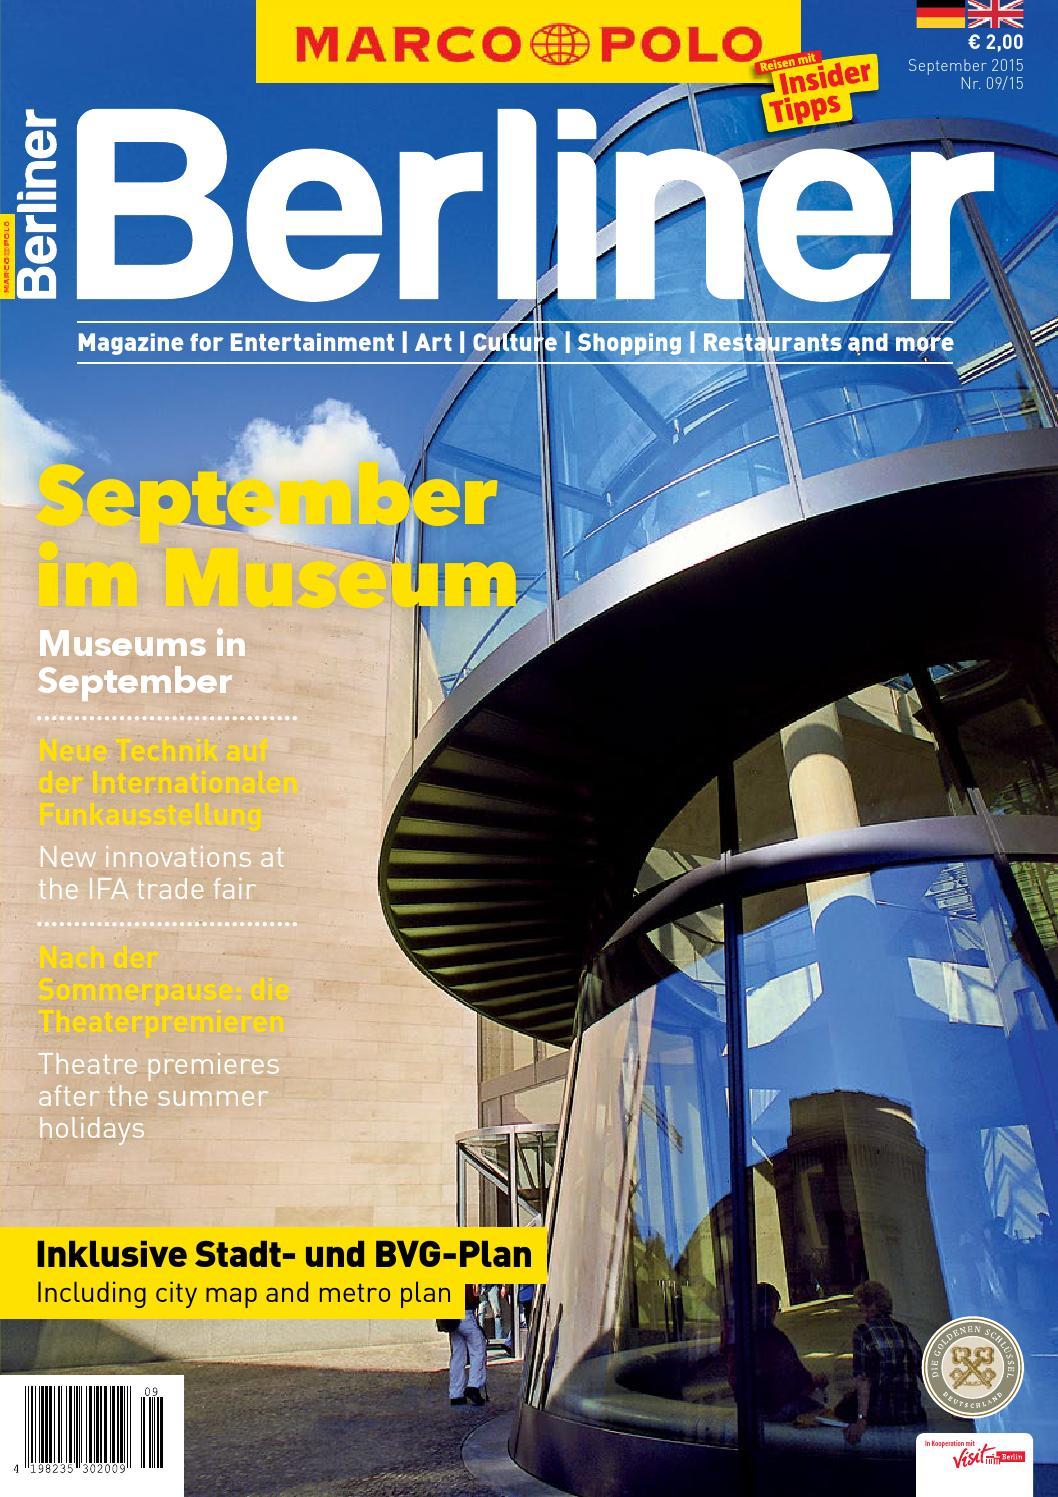 MARCO POLO Berliner 09/15 by Berlin Medien GmbH - issuu